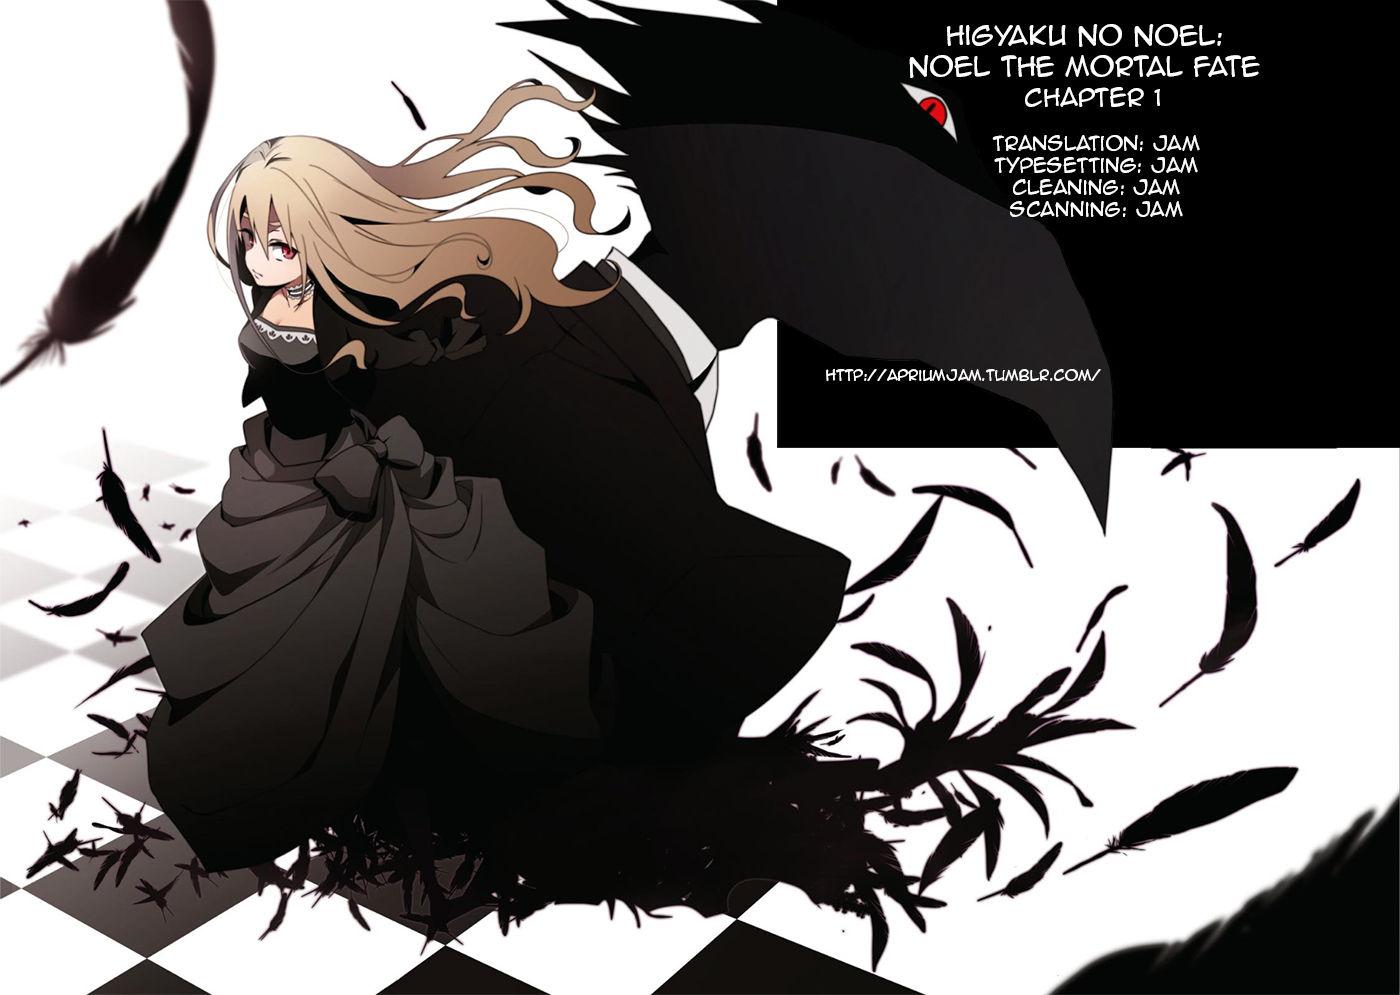 Higyaku no Noel 1: The Worst Day of Her Life at MangaFox